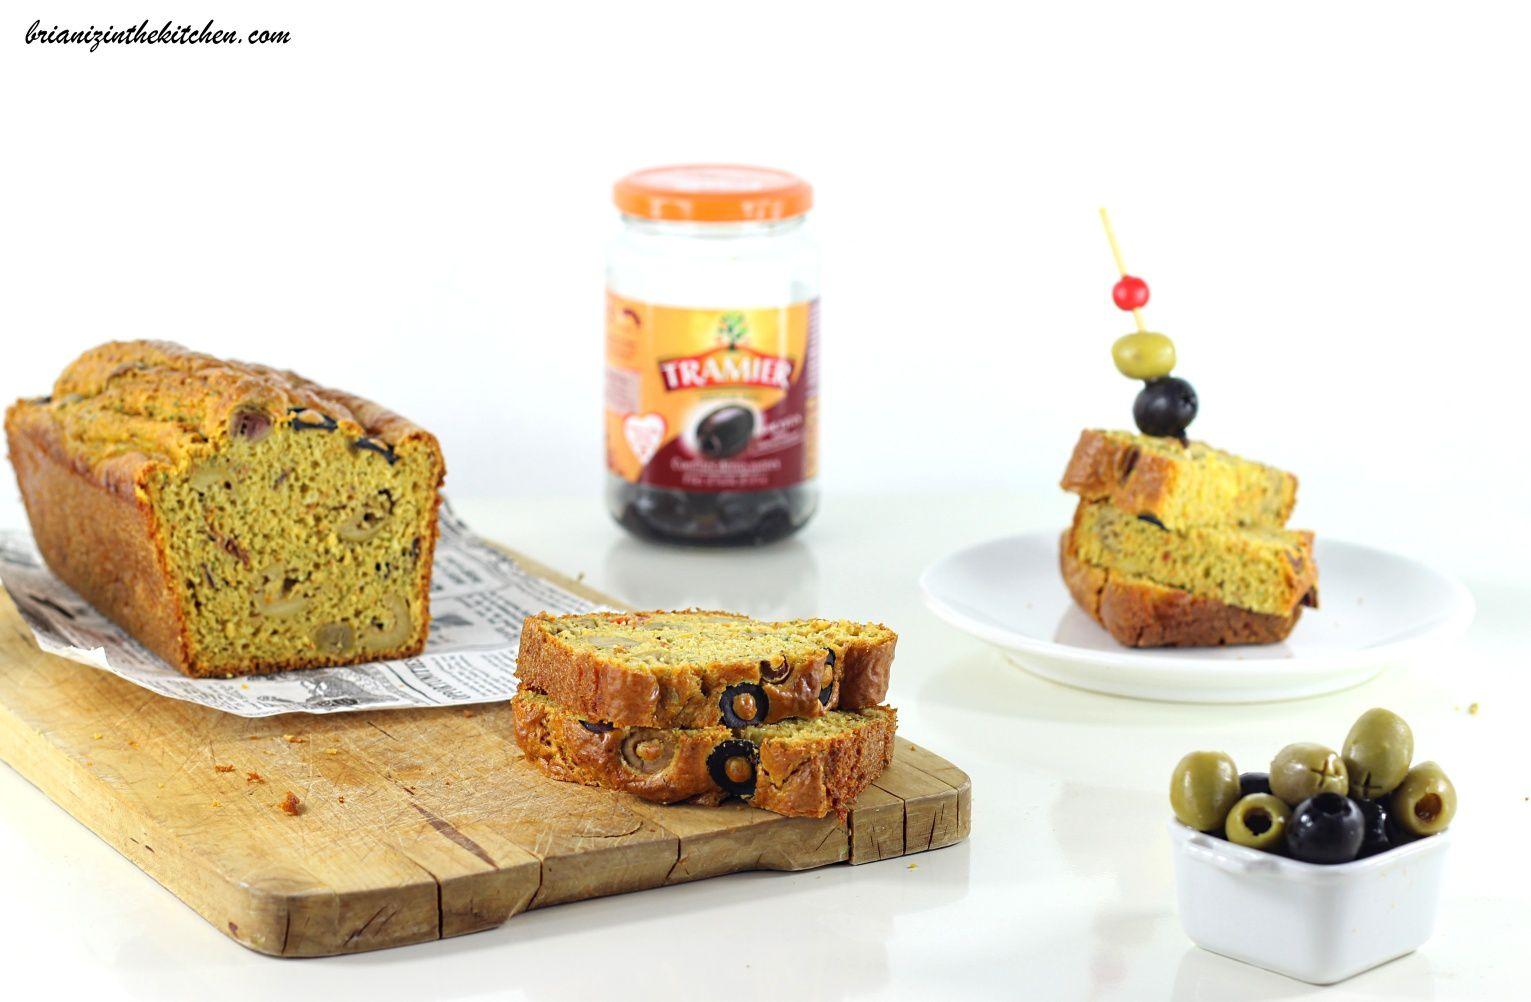 Cake Salé aux Olives